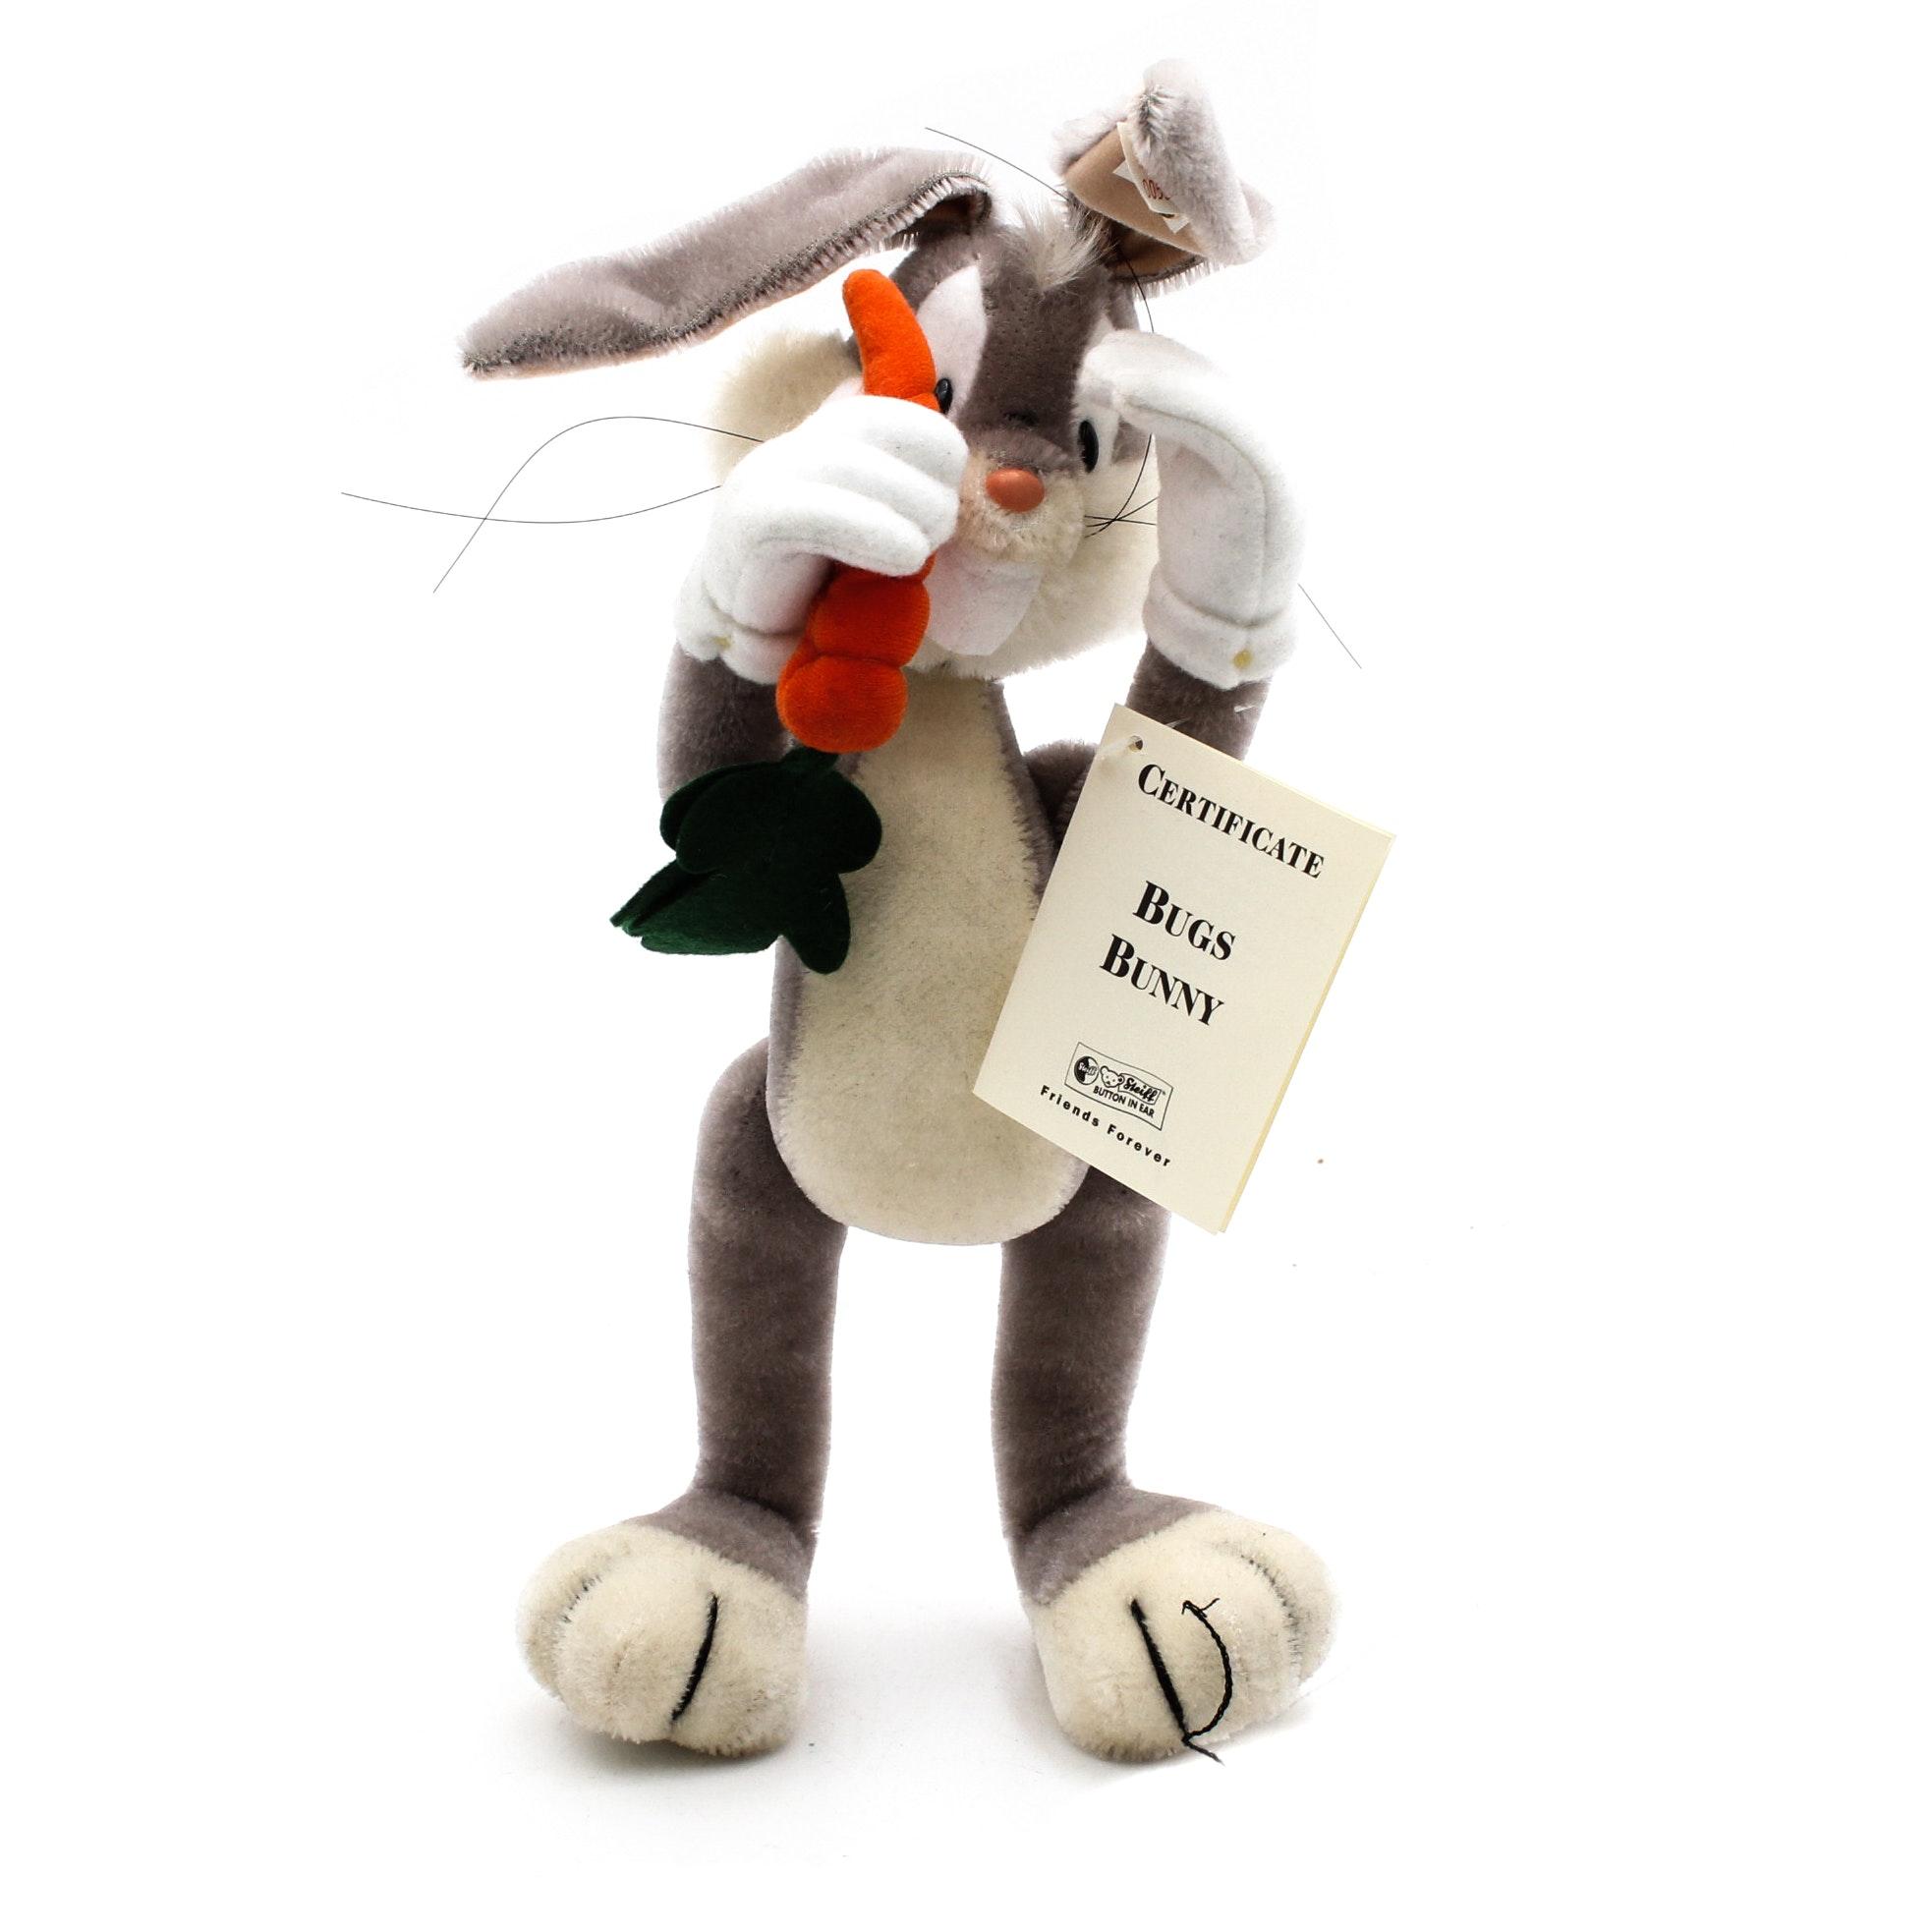 Limited Edition Steiff Bugs Bunny Stuffed Toy